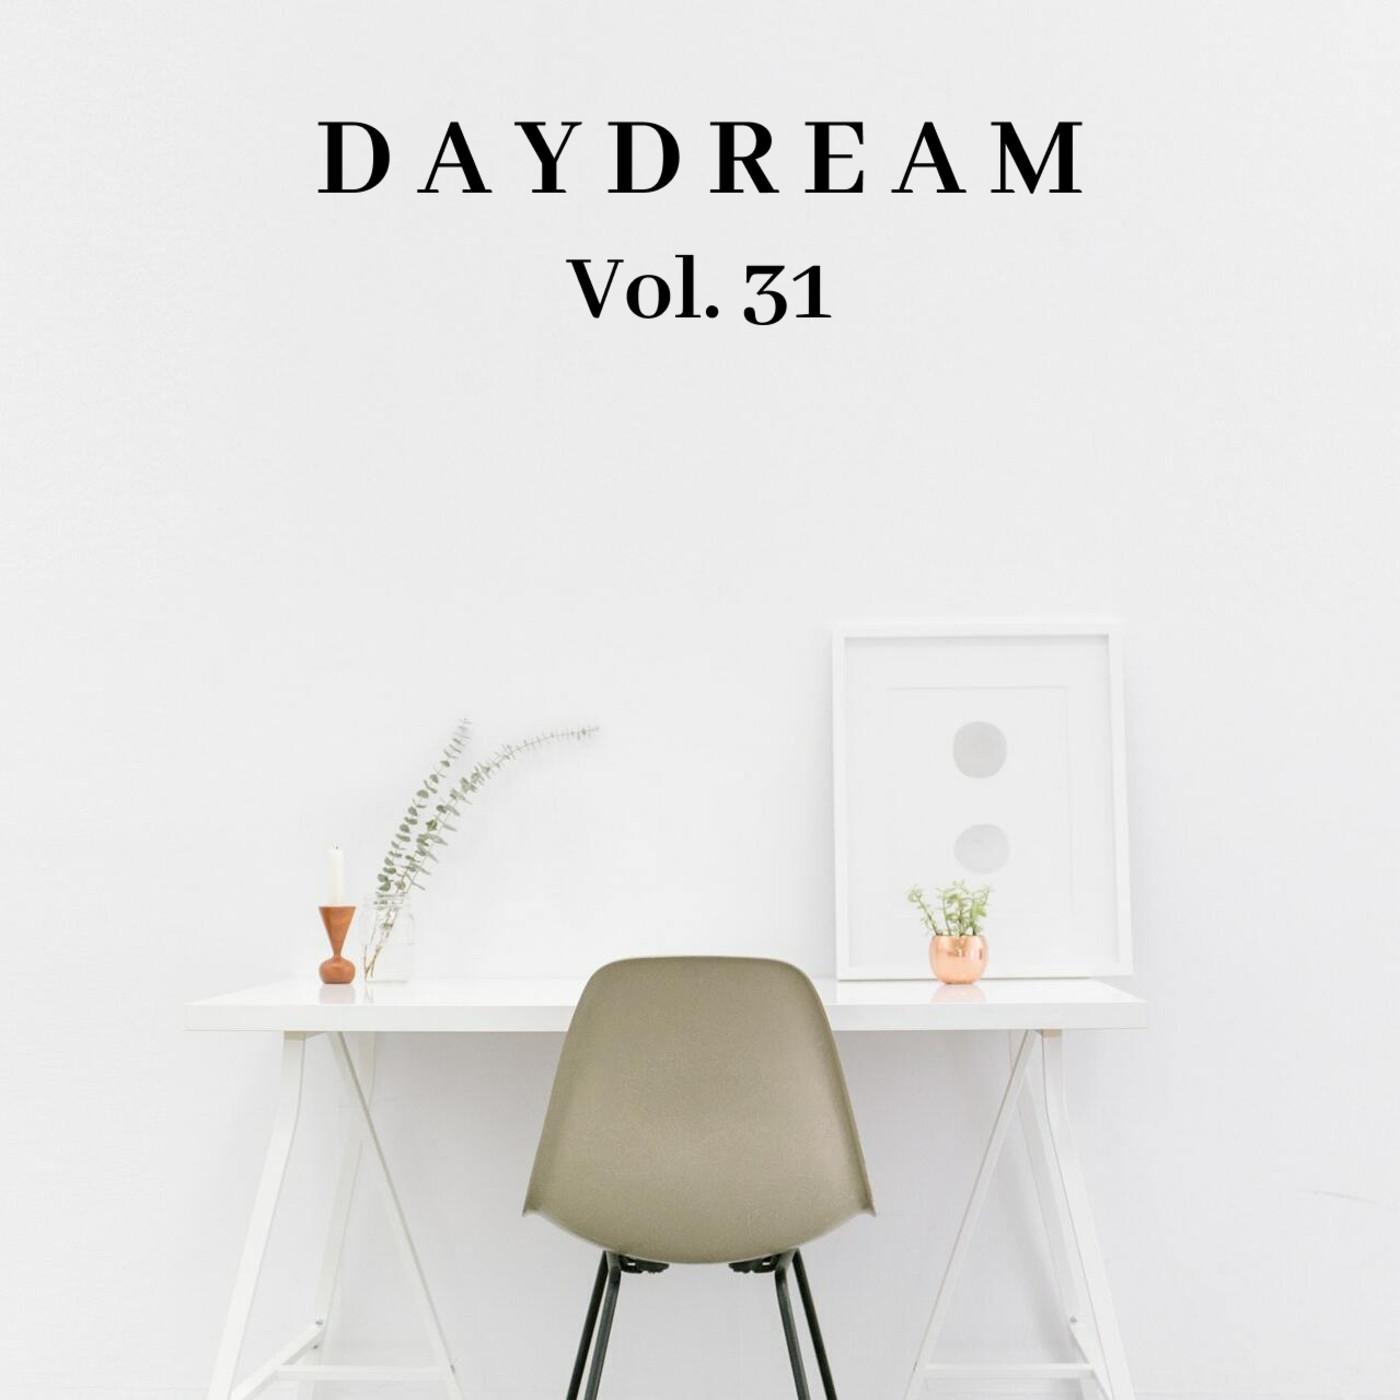 DayDream Vol. 31